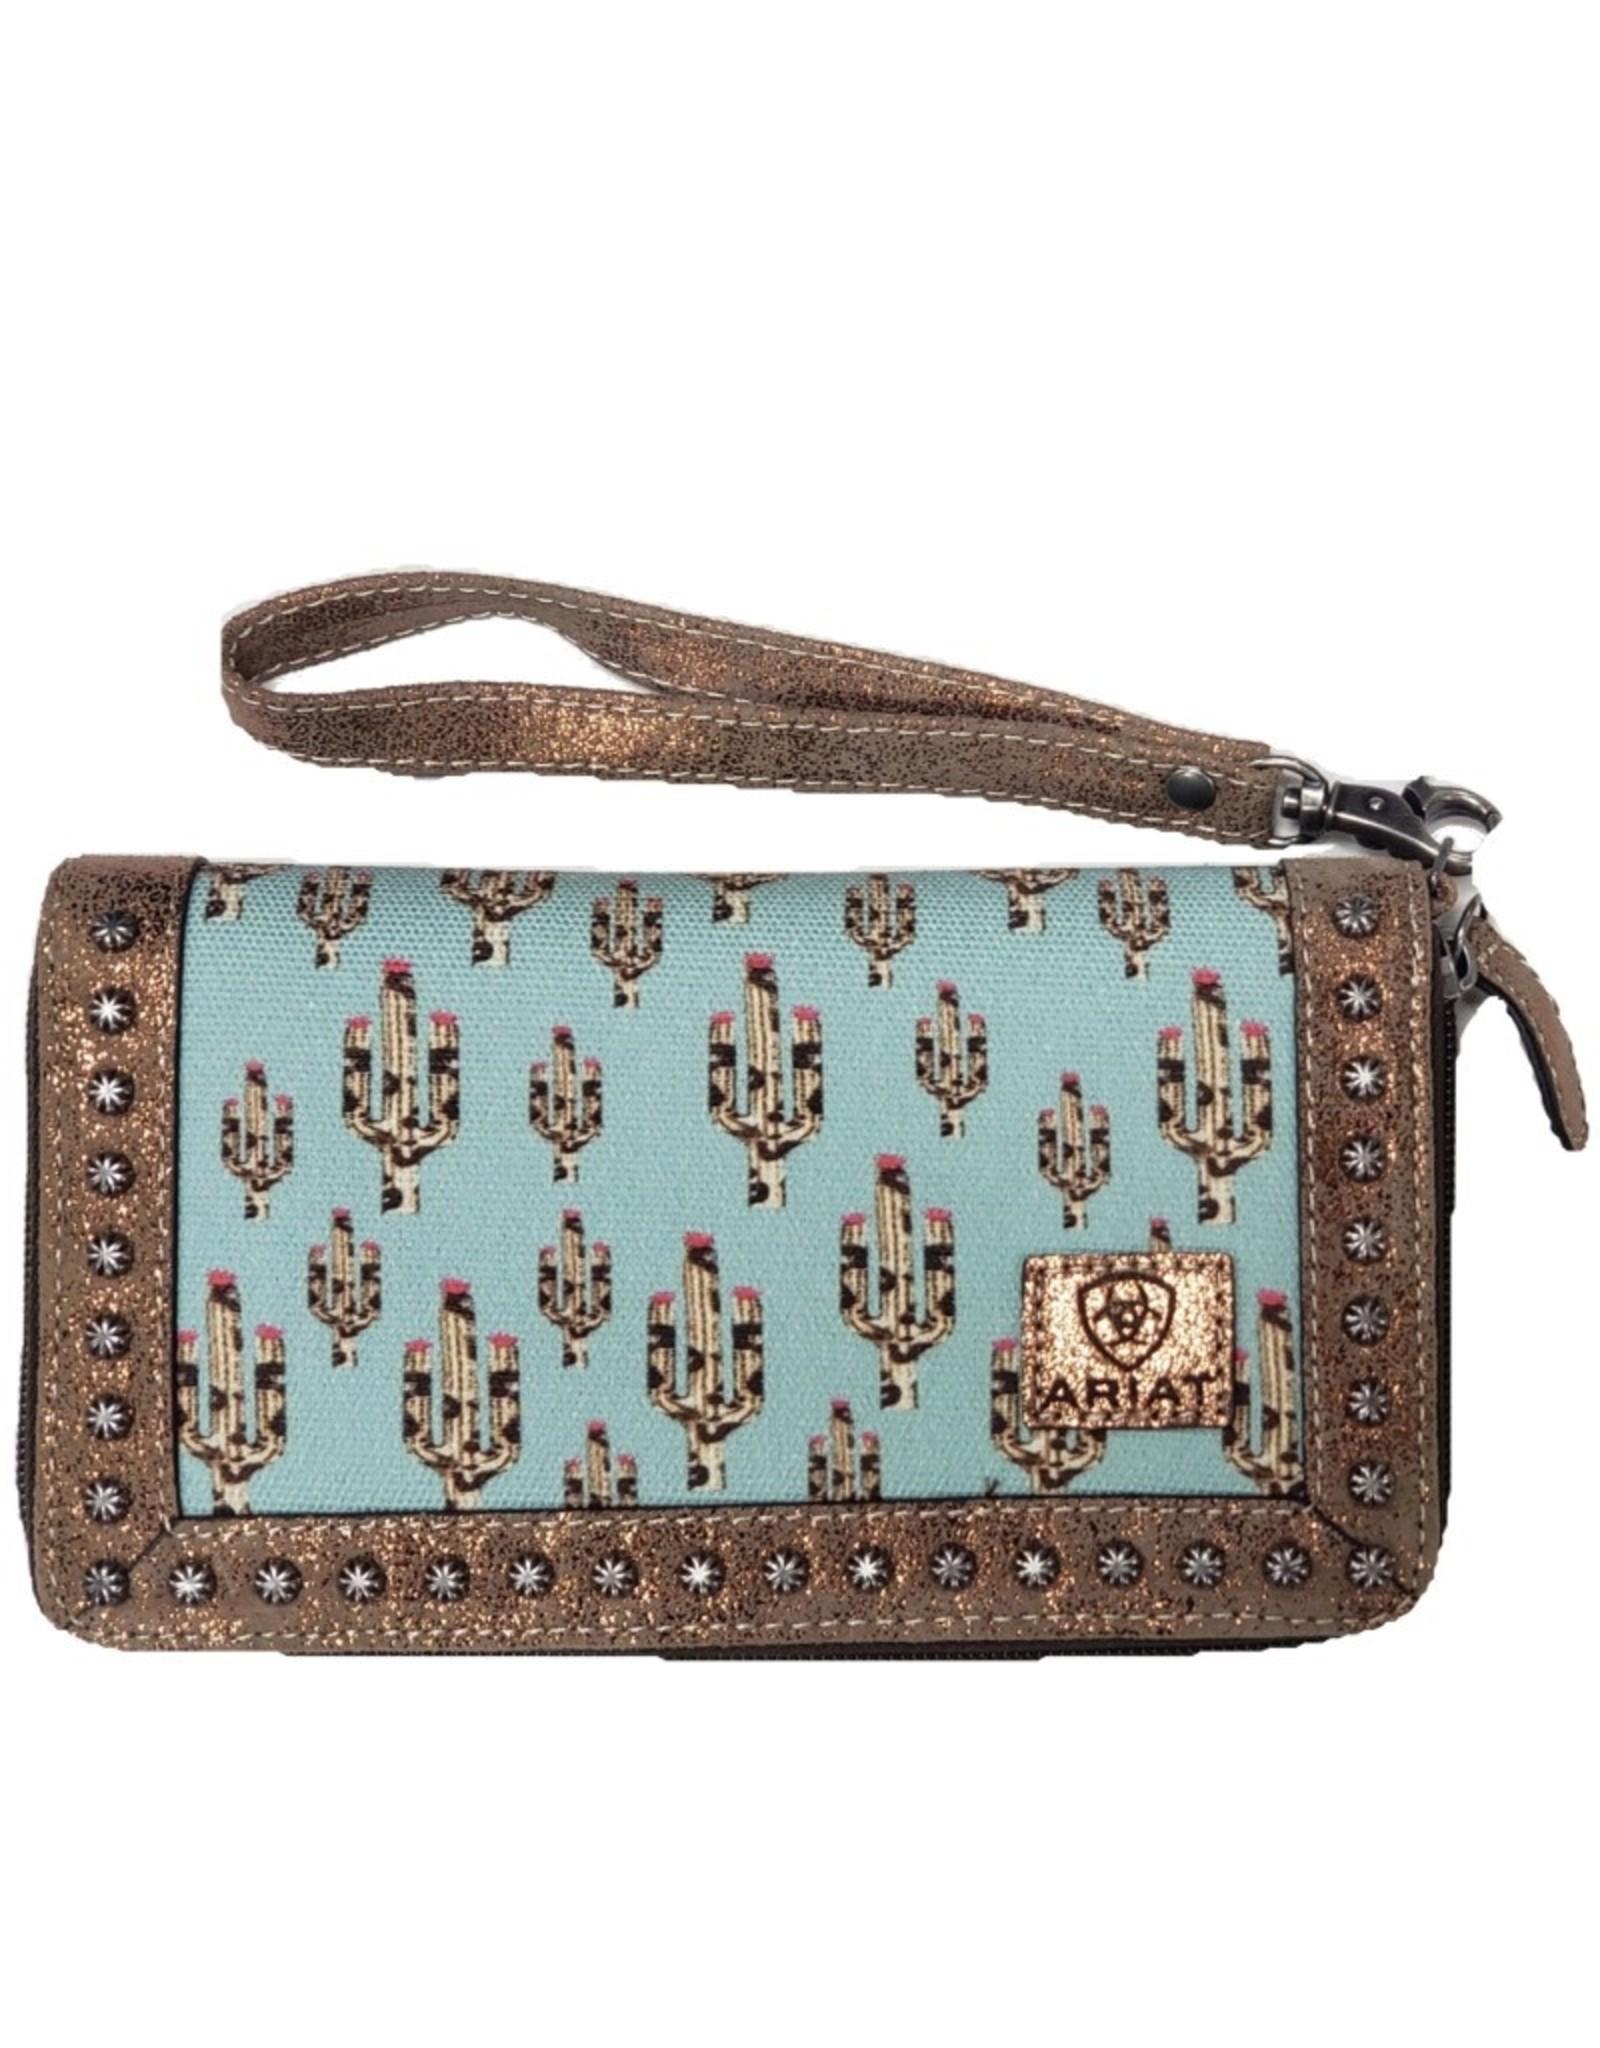 Ariat Ariat Matching Cruiser Wallet Light Turquoise Leopard Cactus Print